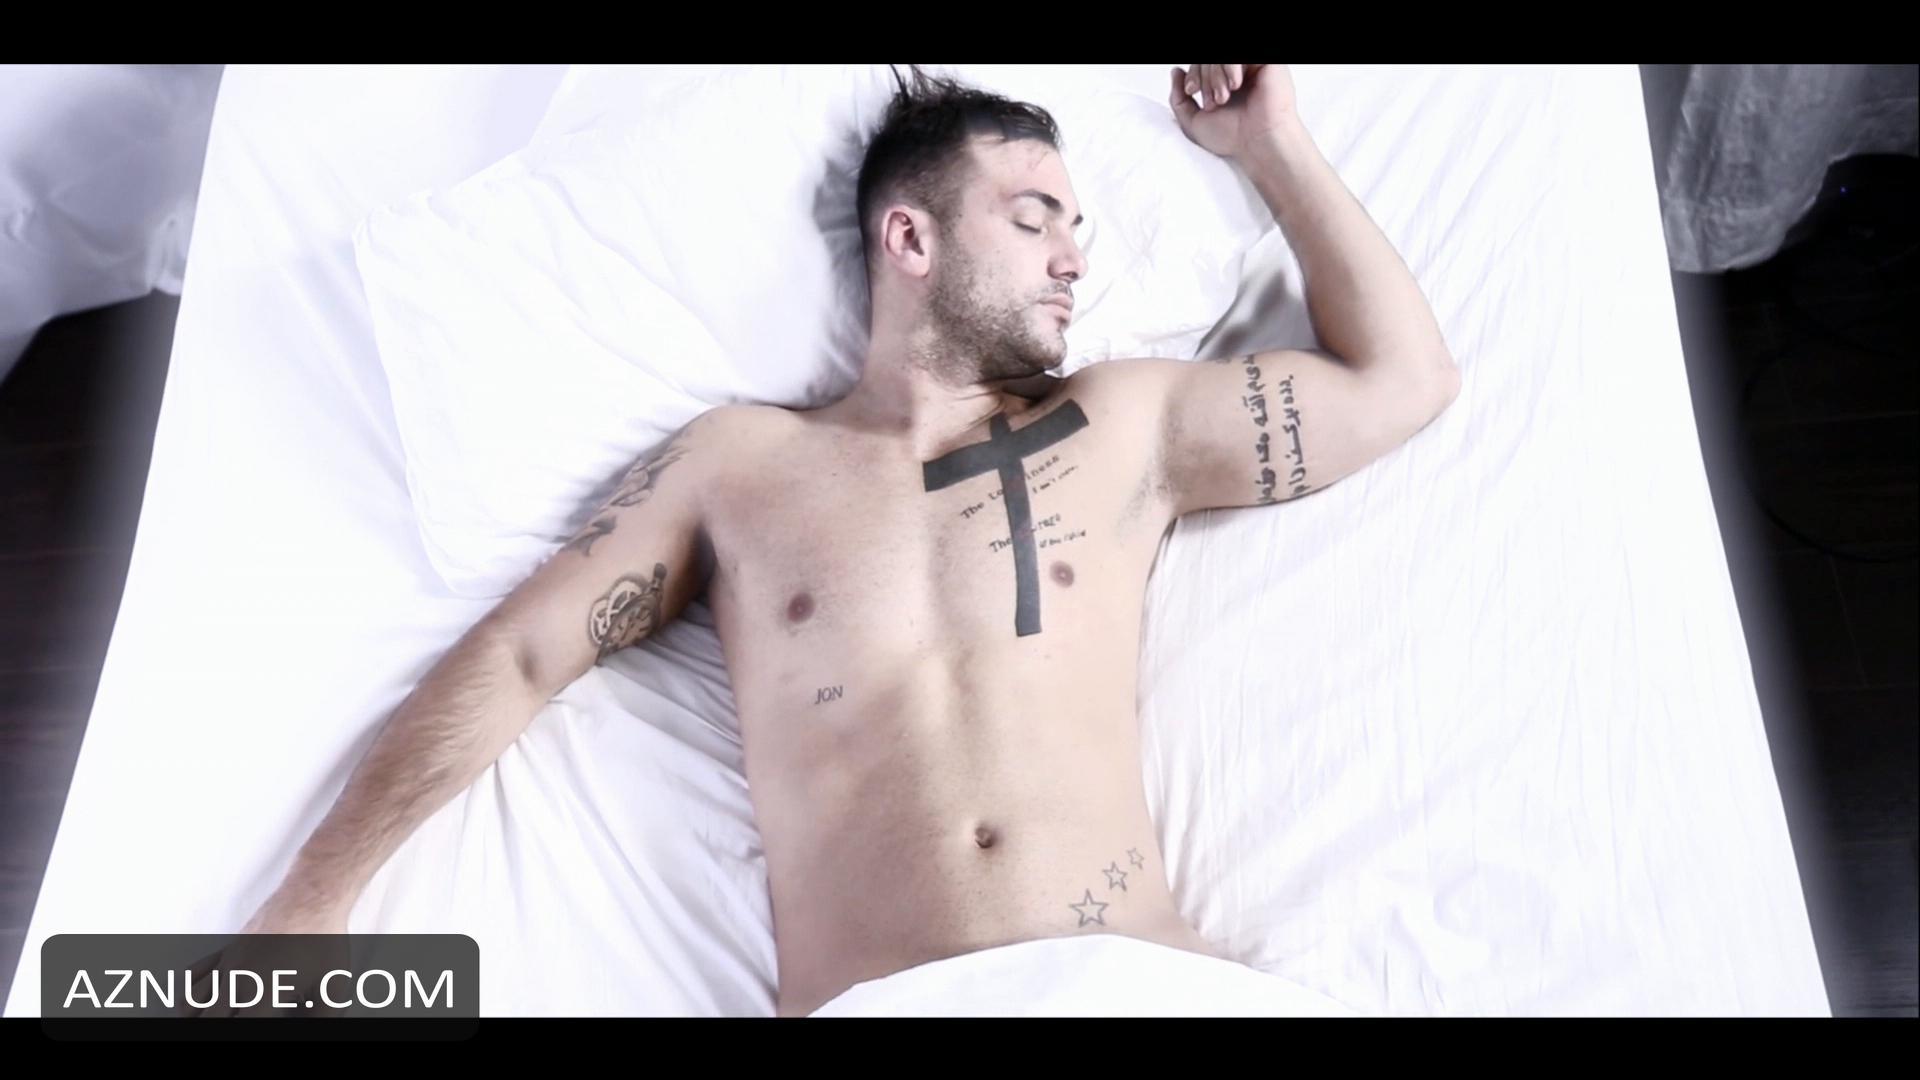 Hanna hilton free videos nude